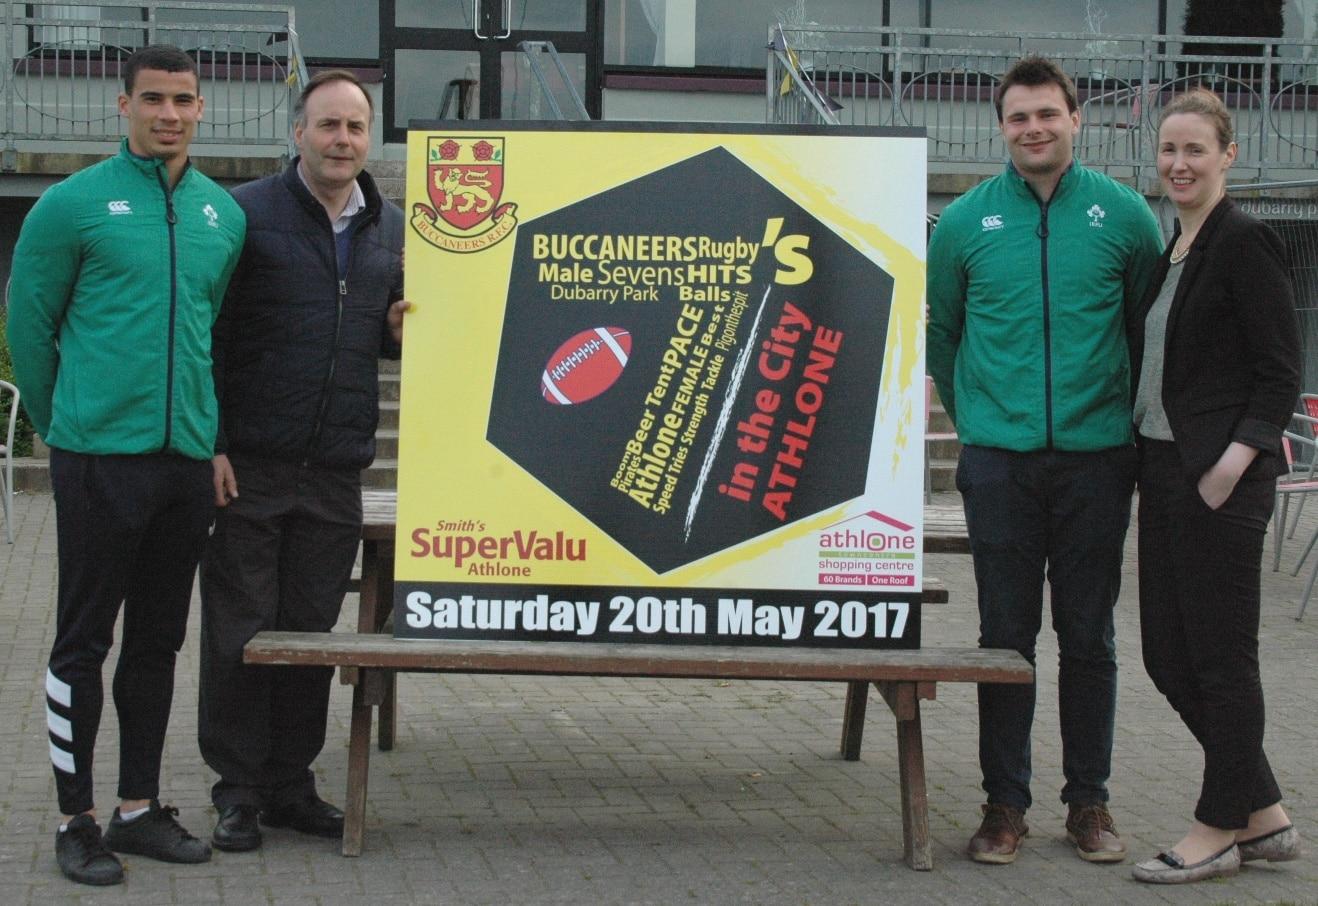 Athlone 7's in the City Buccaneers RFC